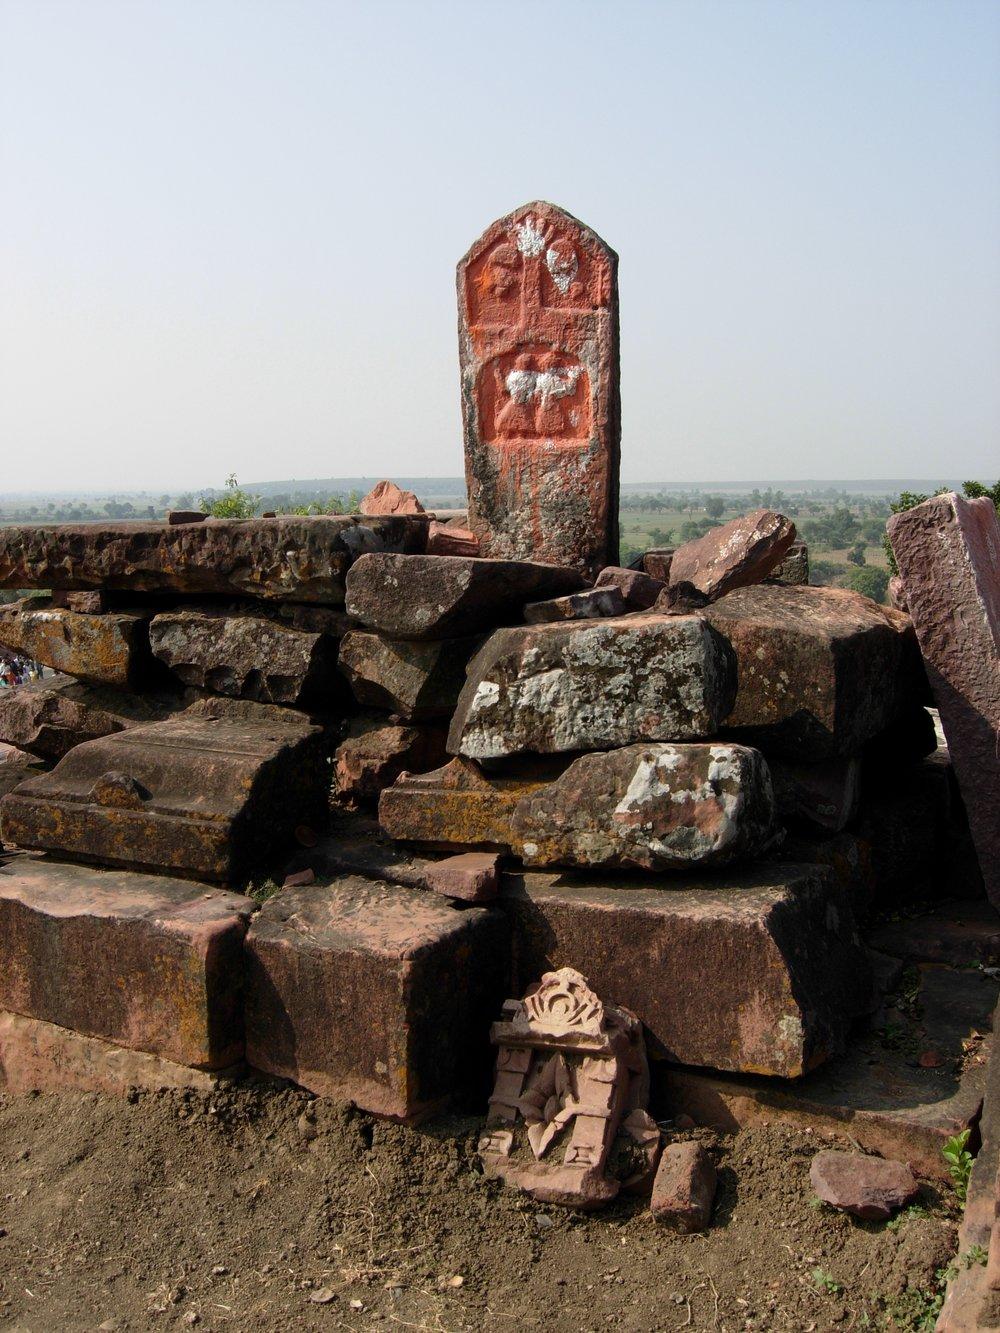 Bhojpur, Madhya Pradesh. India. Sati pillar at the temple. By zippymarmalade (Own work) []. vi Wikimedia Commons